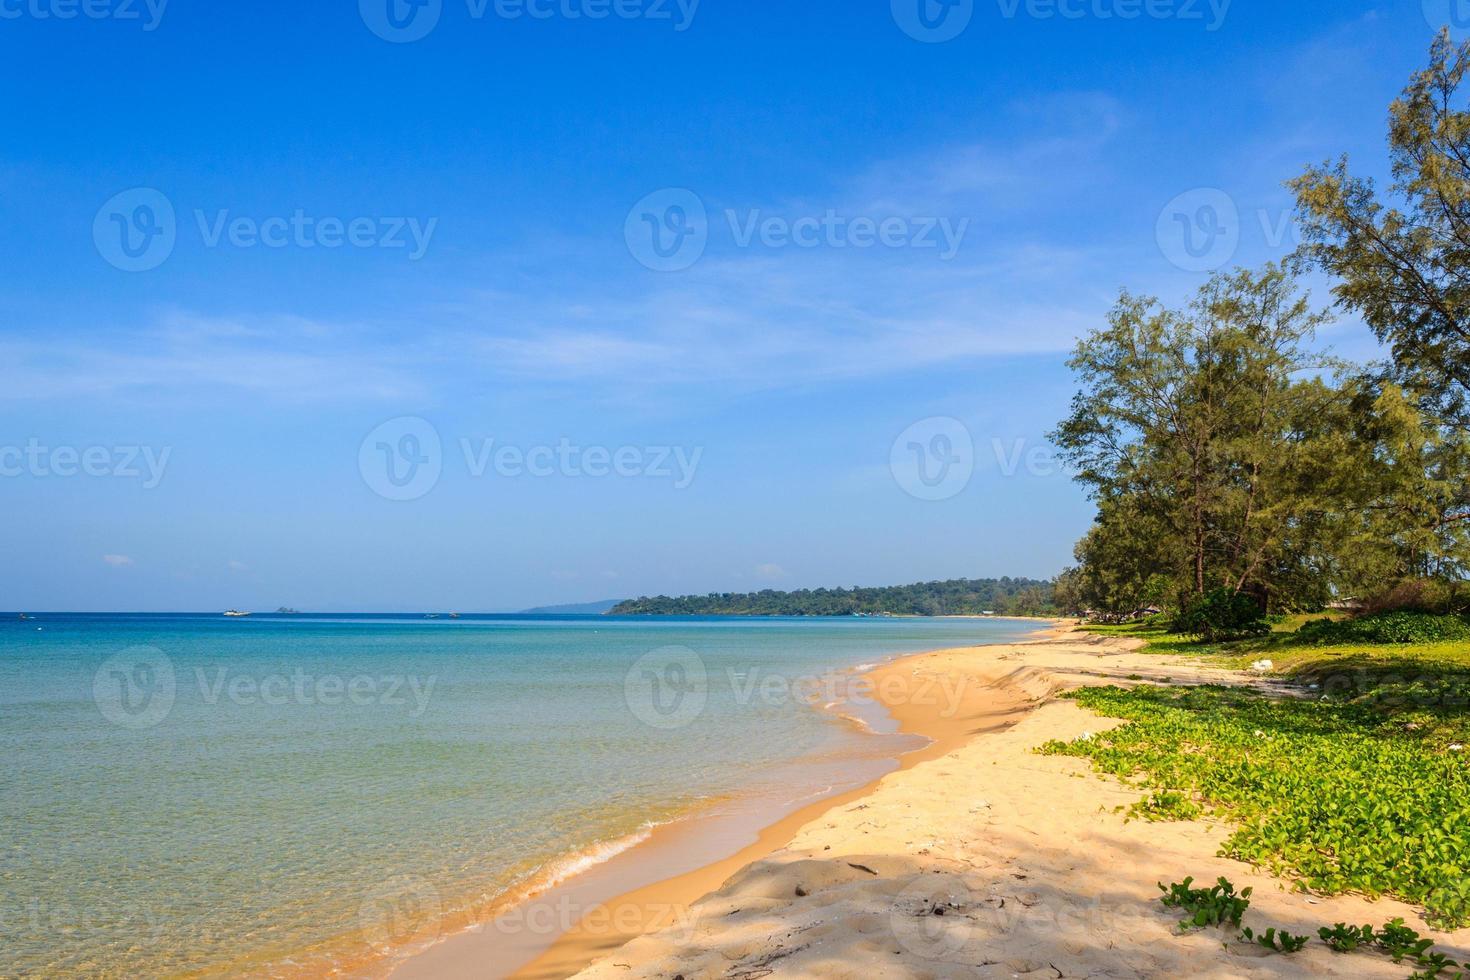 linda da praia baidai foto